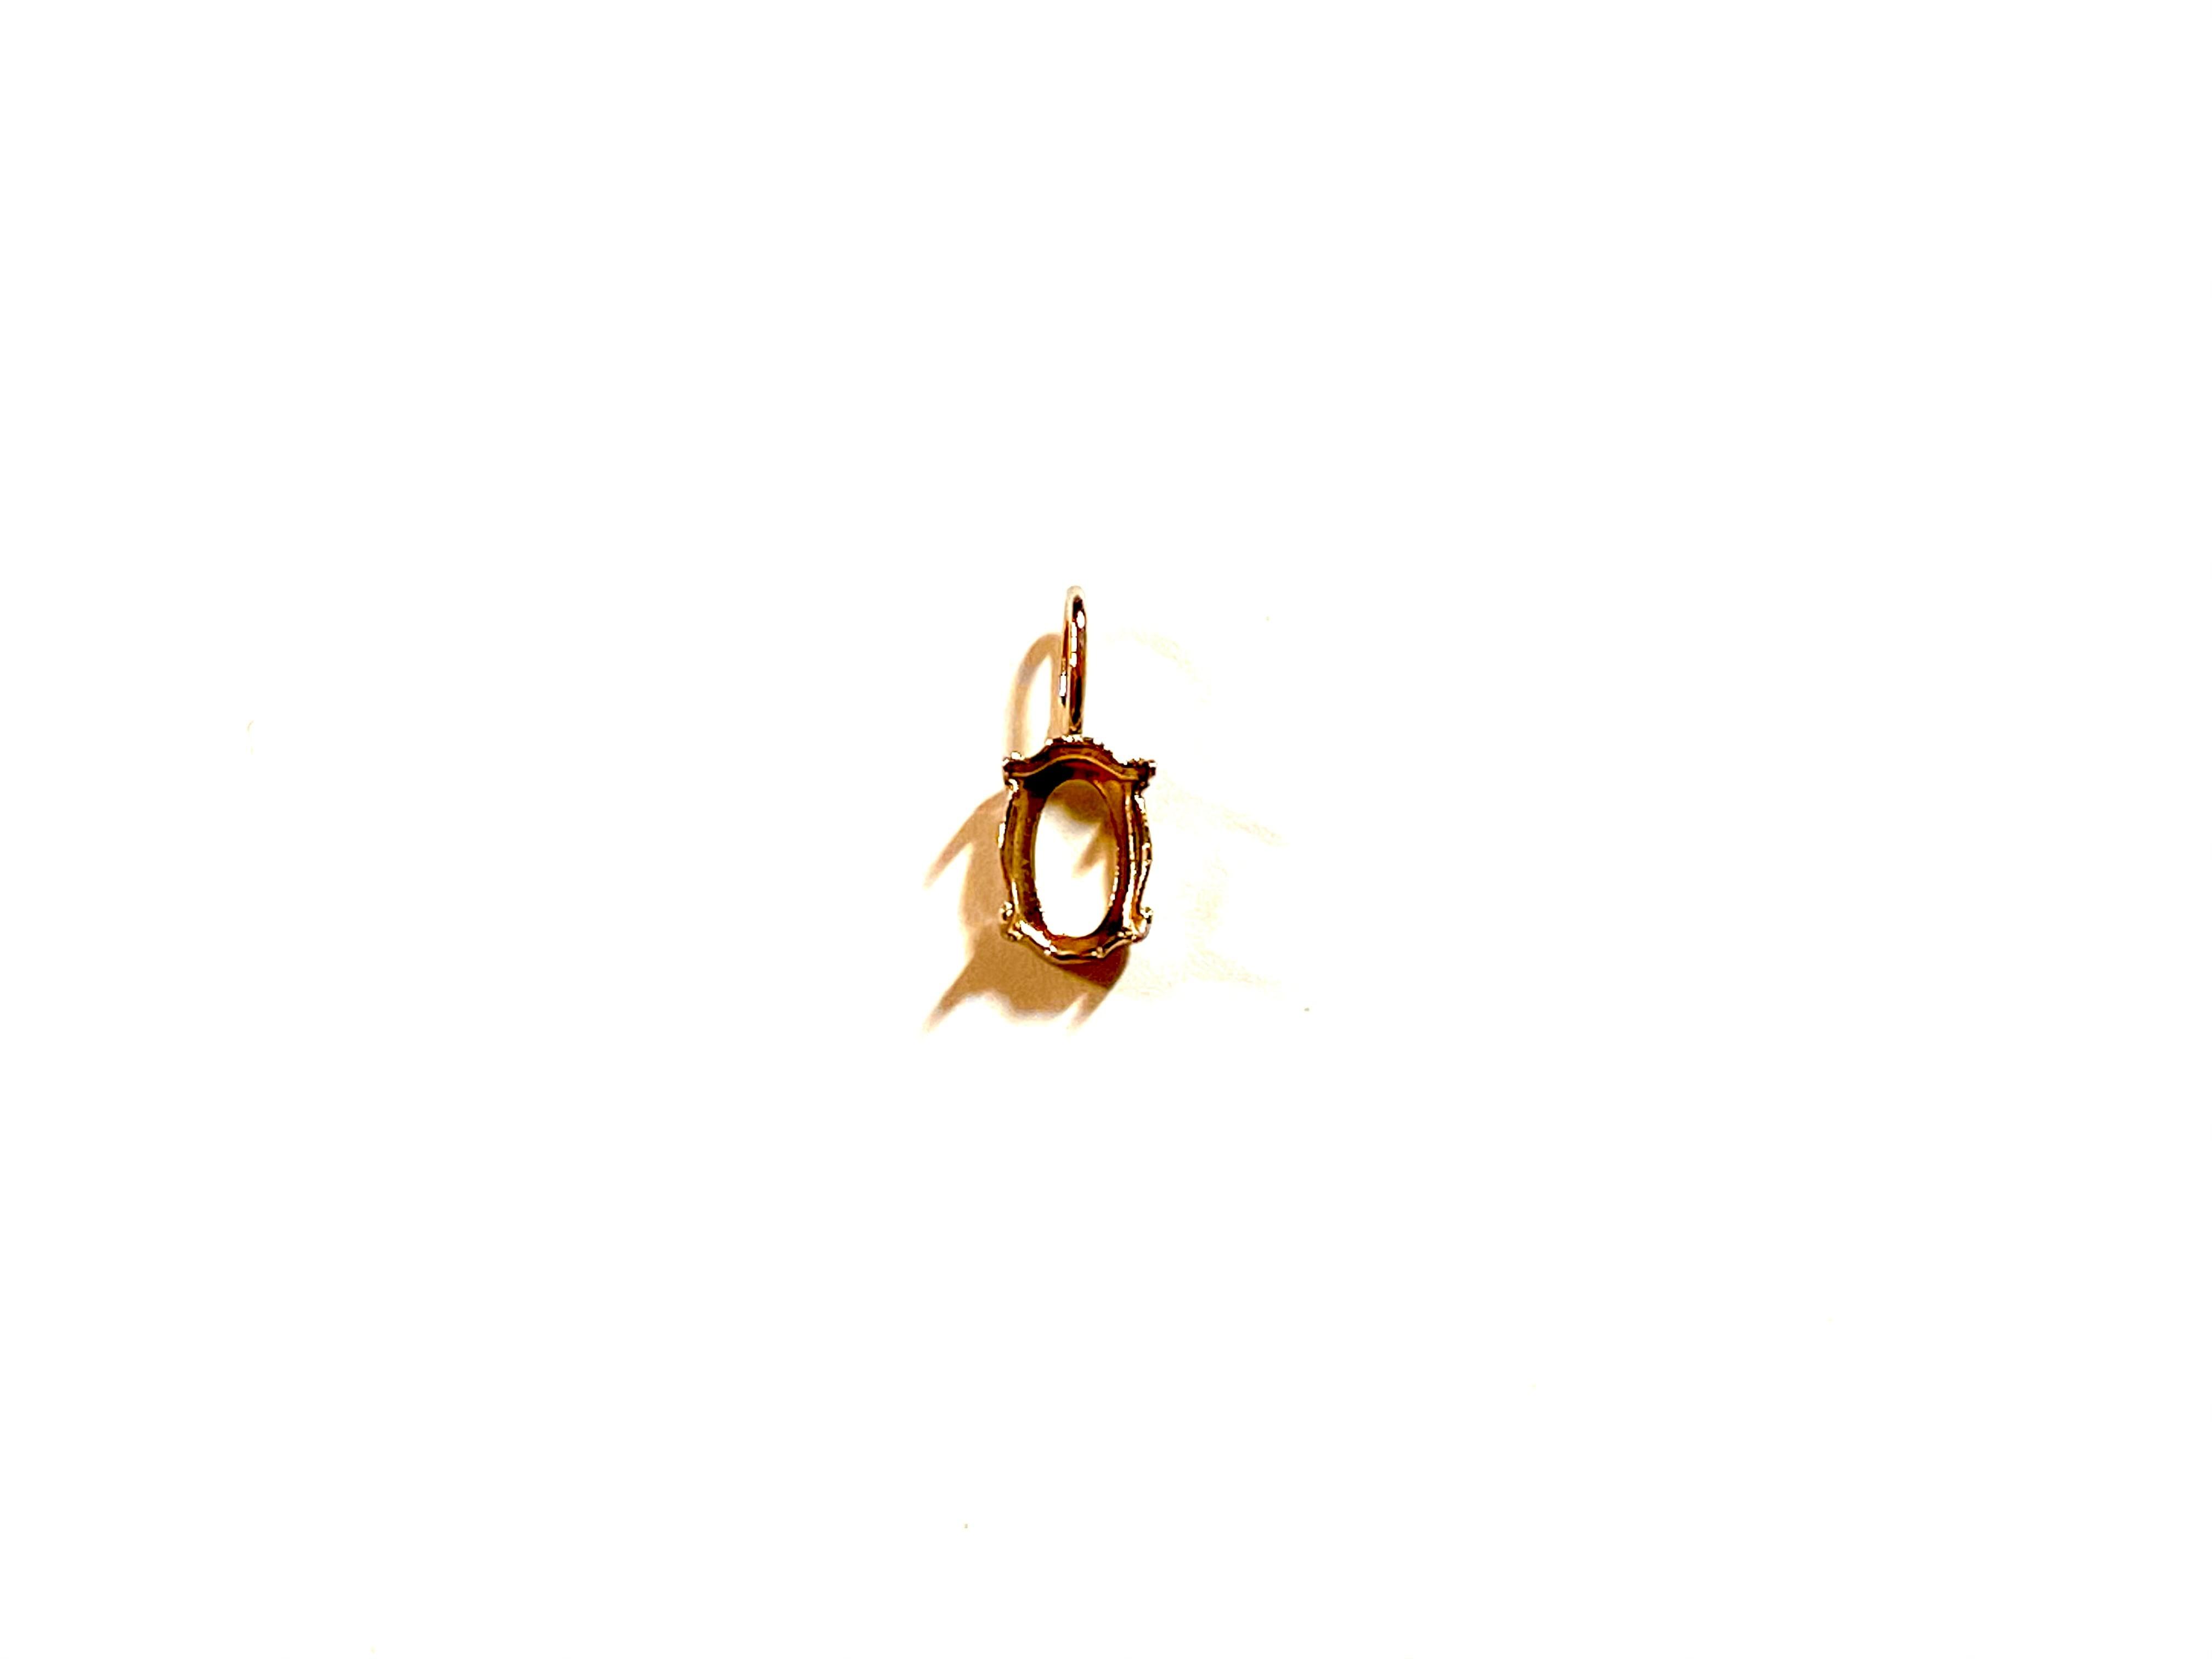 【K10YG】『タテ5mm ヨコ3mm』 オーバルカット対応空枠 [空枠No,2]